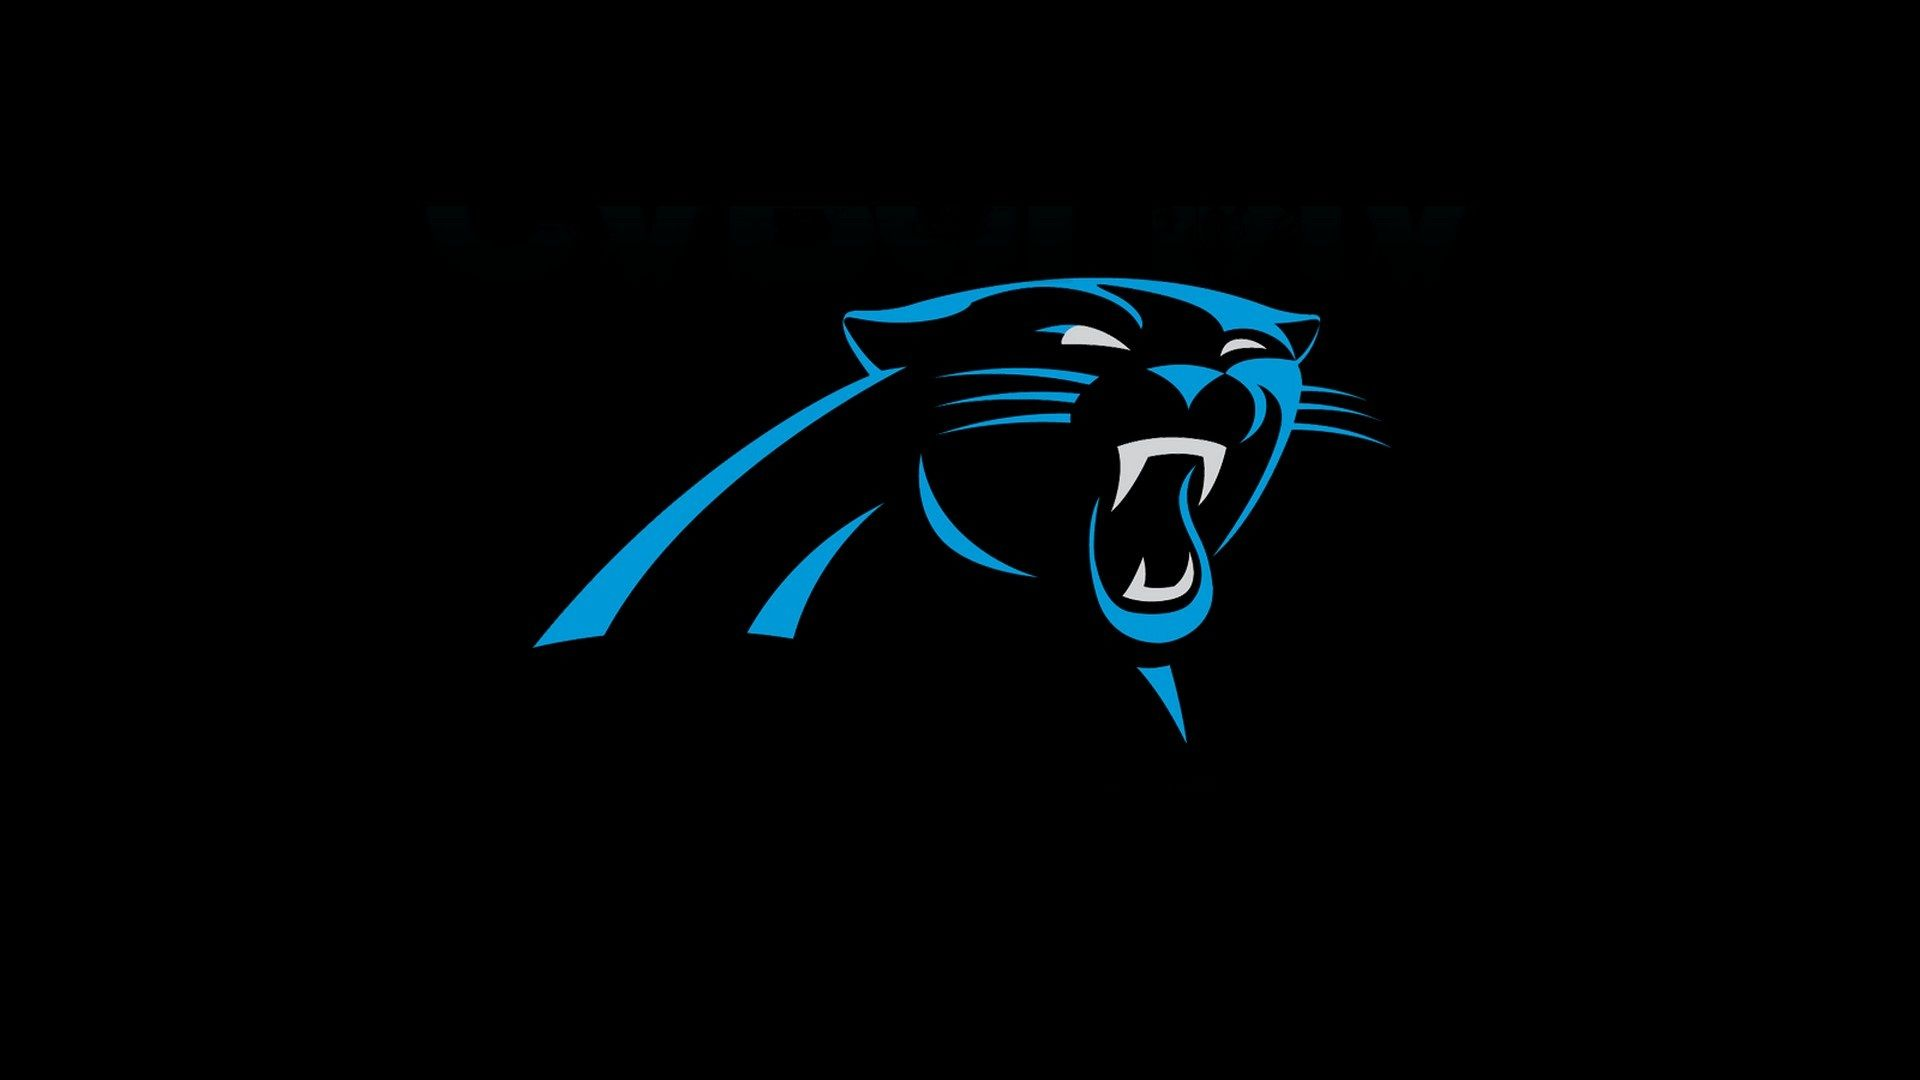 Carolina Panthers Wallpaper Hd 2021 Nfl Football Wallpapers Carolina Panthers Wallpaper Nfl Football Wallpaper Carolina Panthers